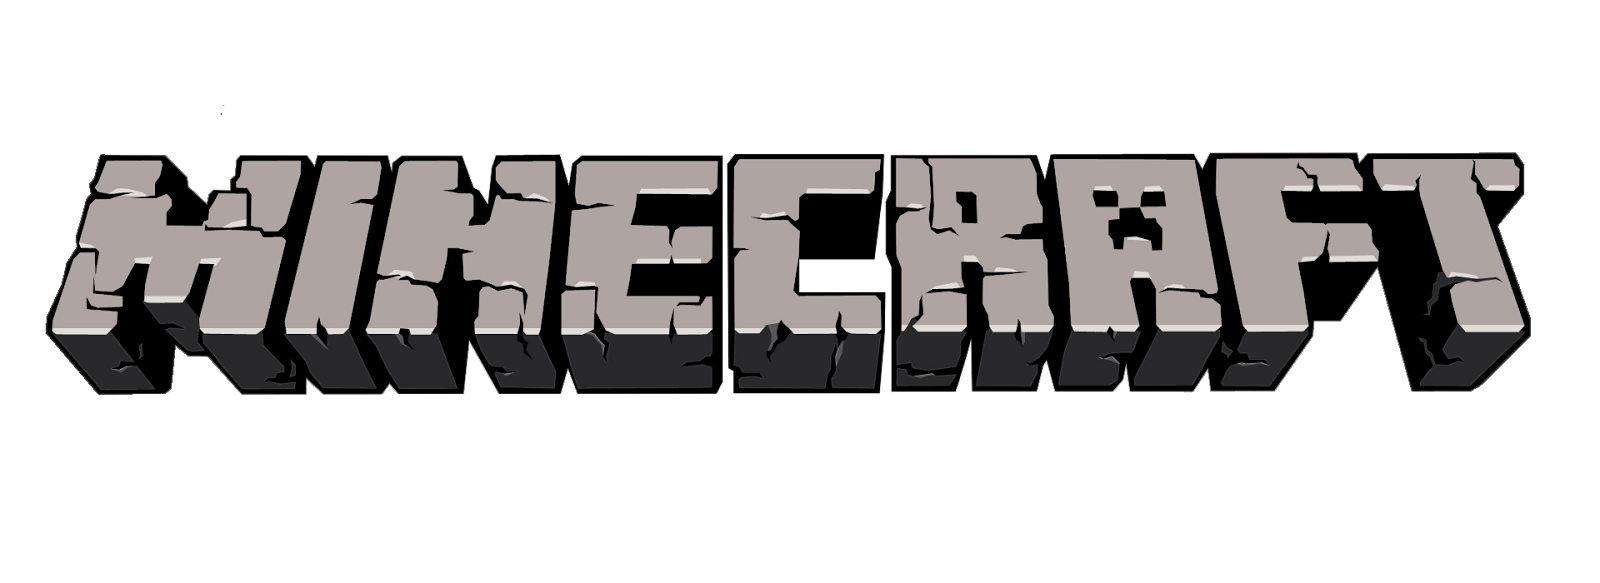 minecraft background template - photo #34